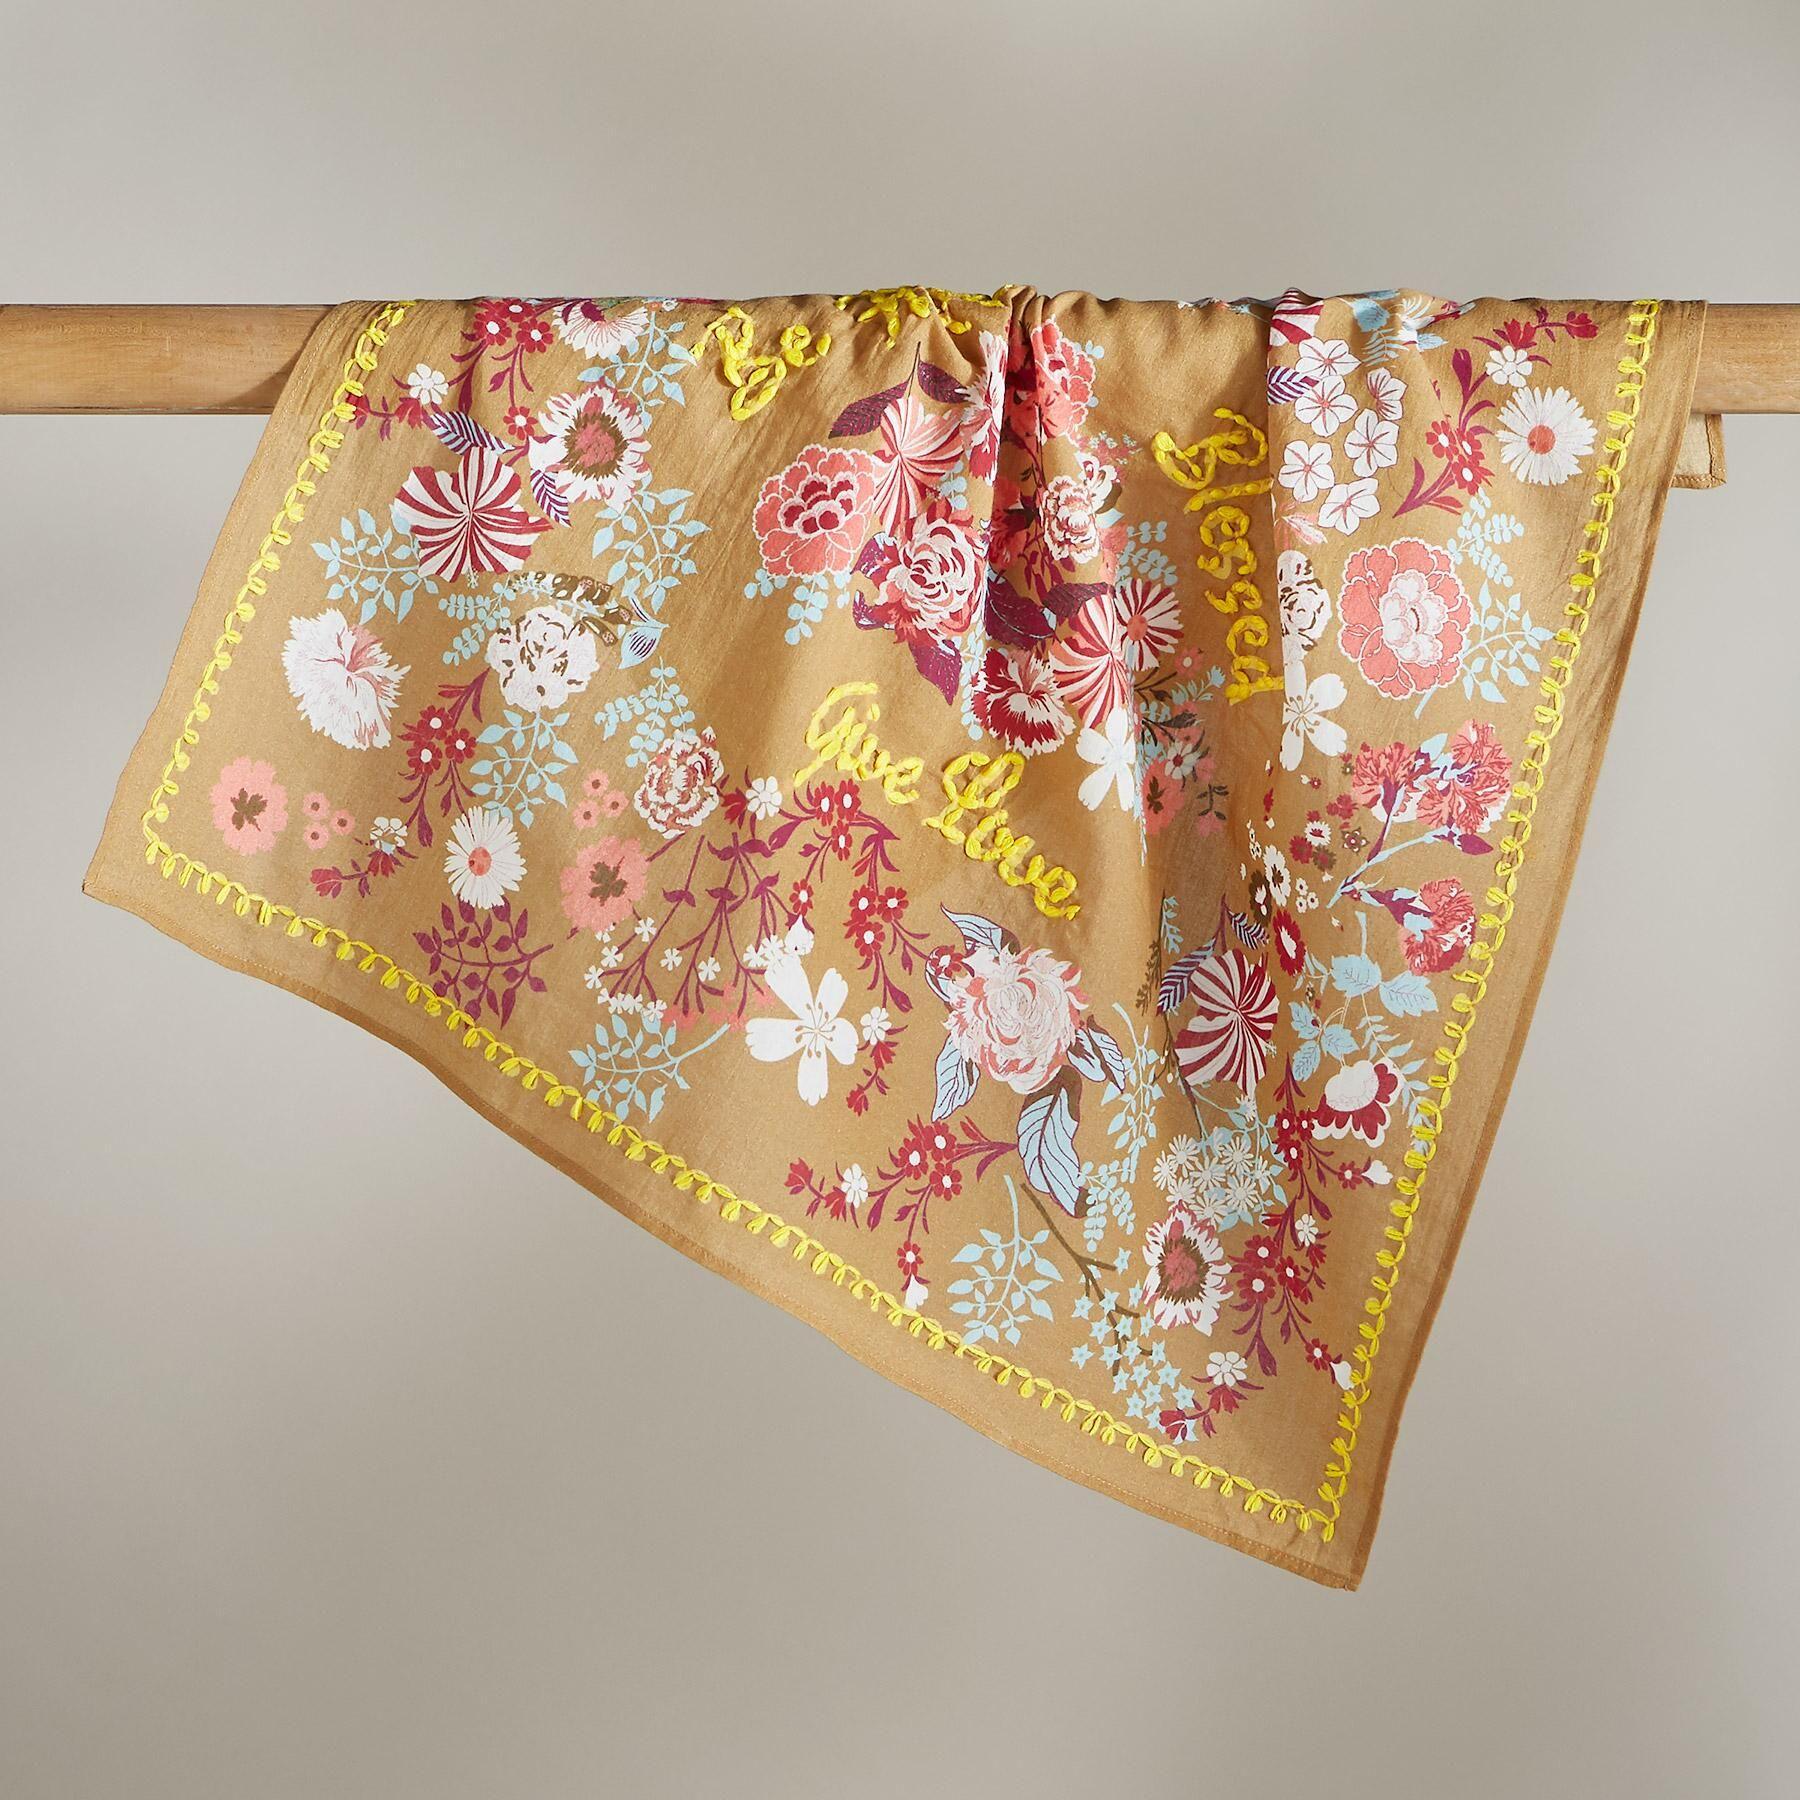 Embroidered cotton bandanas 1 in 2020 cotton bandanas